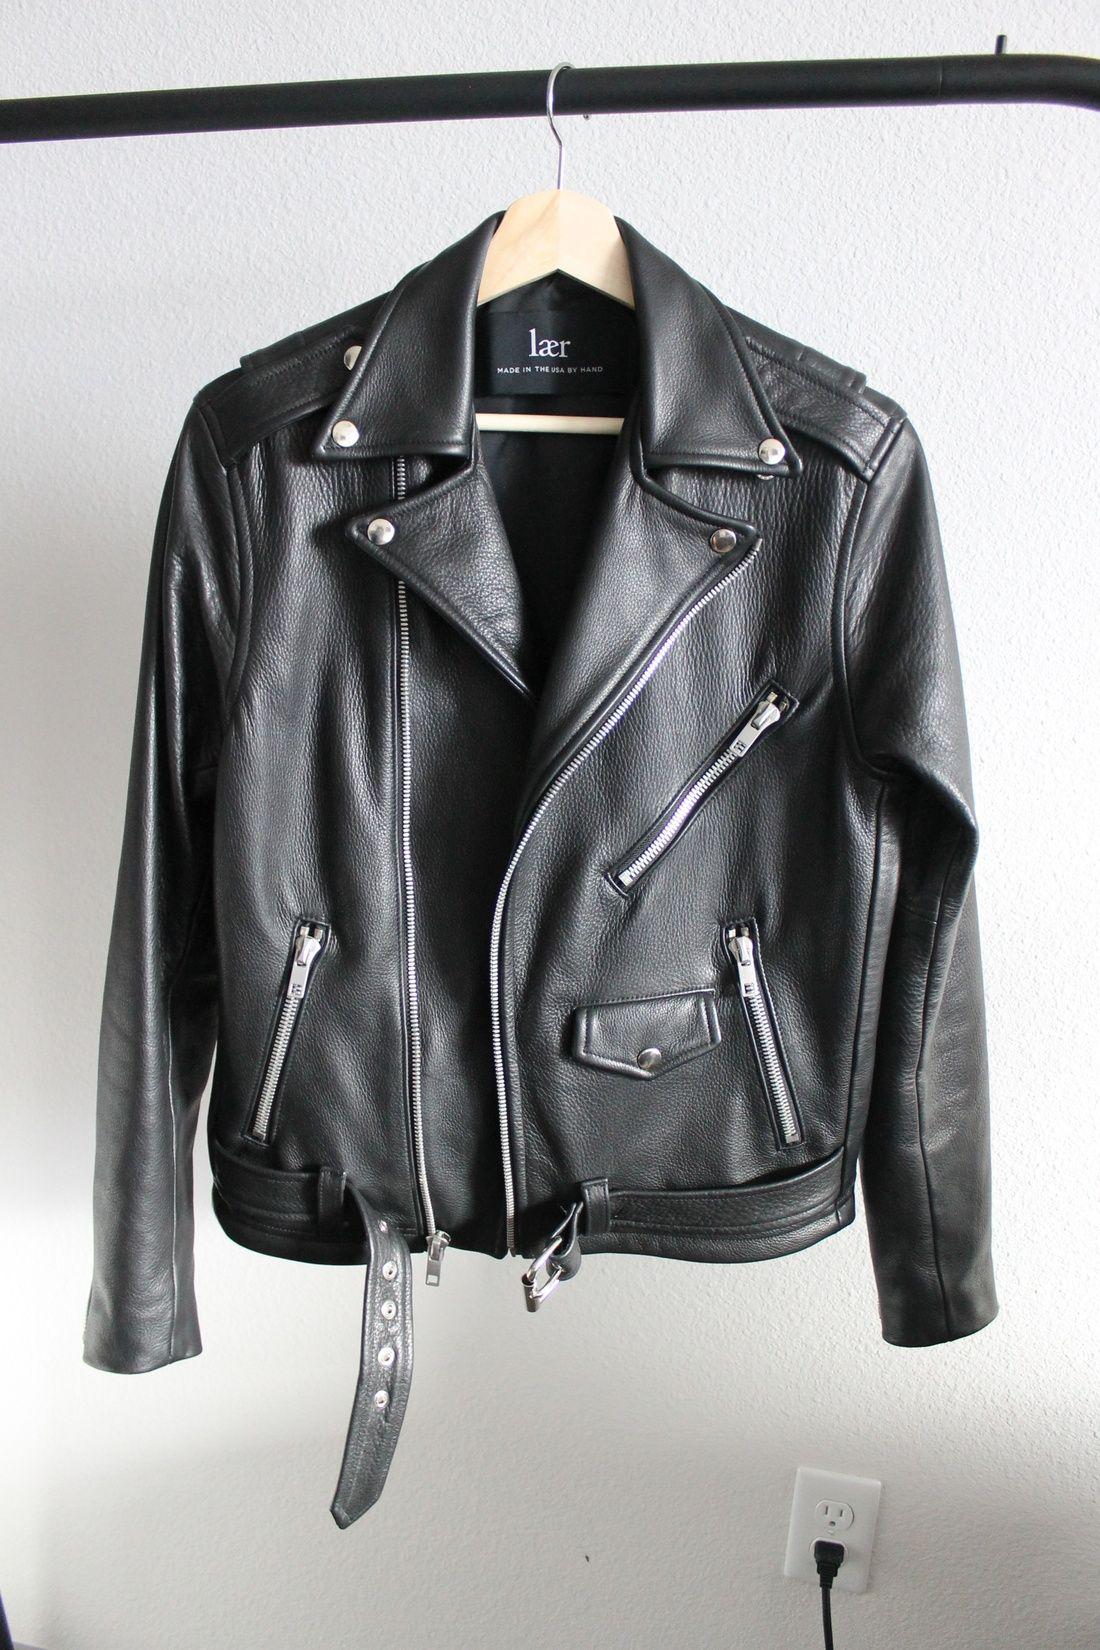 Laer Classic Leather Biker Jacket Size Xs 583 Grailed Leather Biker Jacket Clothes Biker Jacket